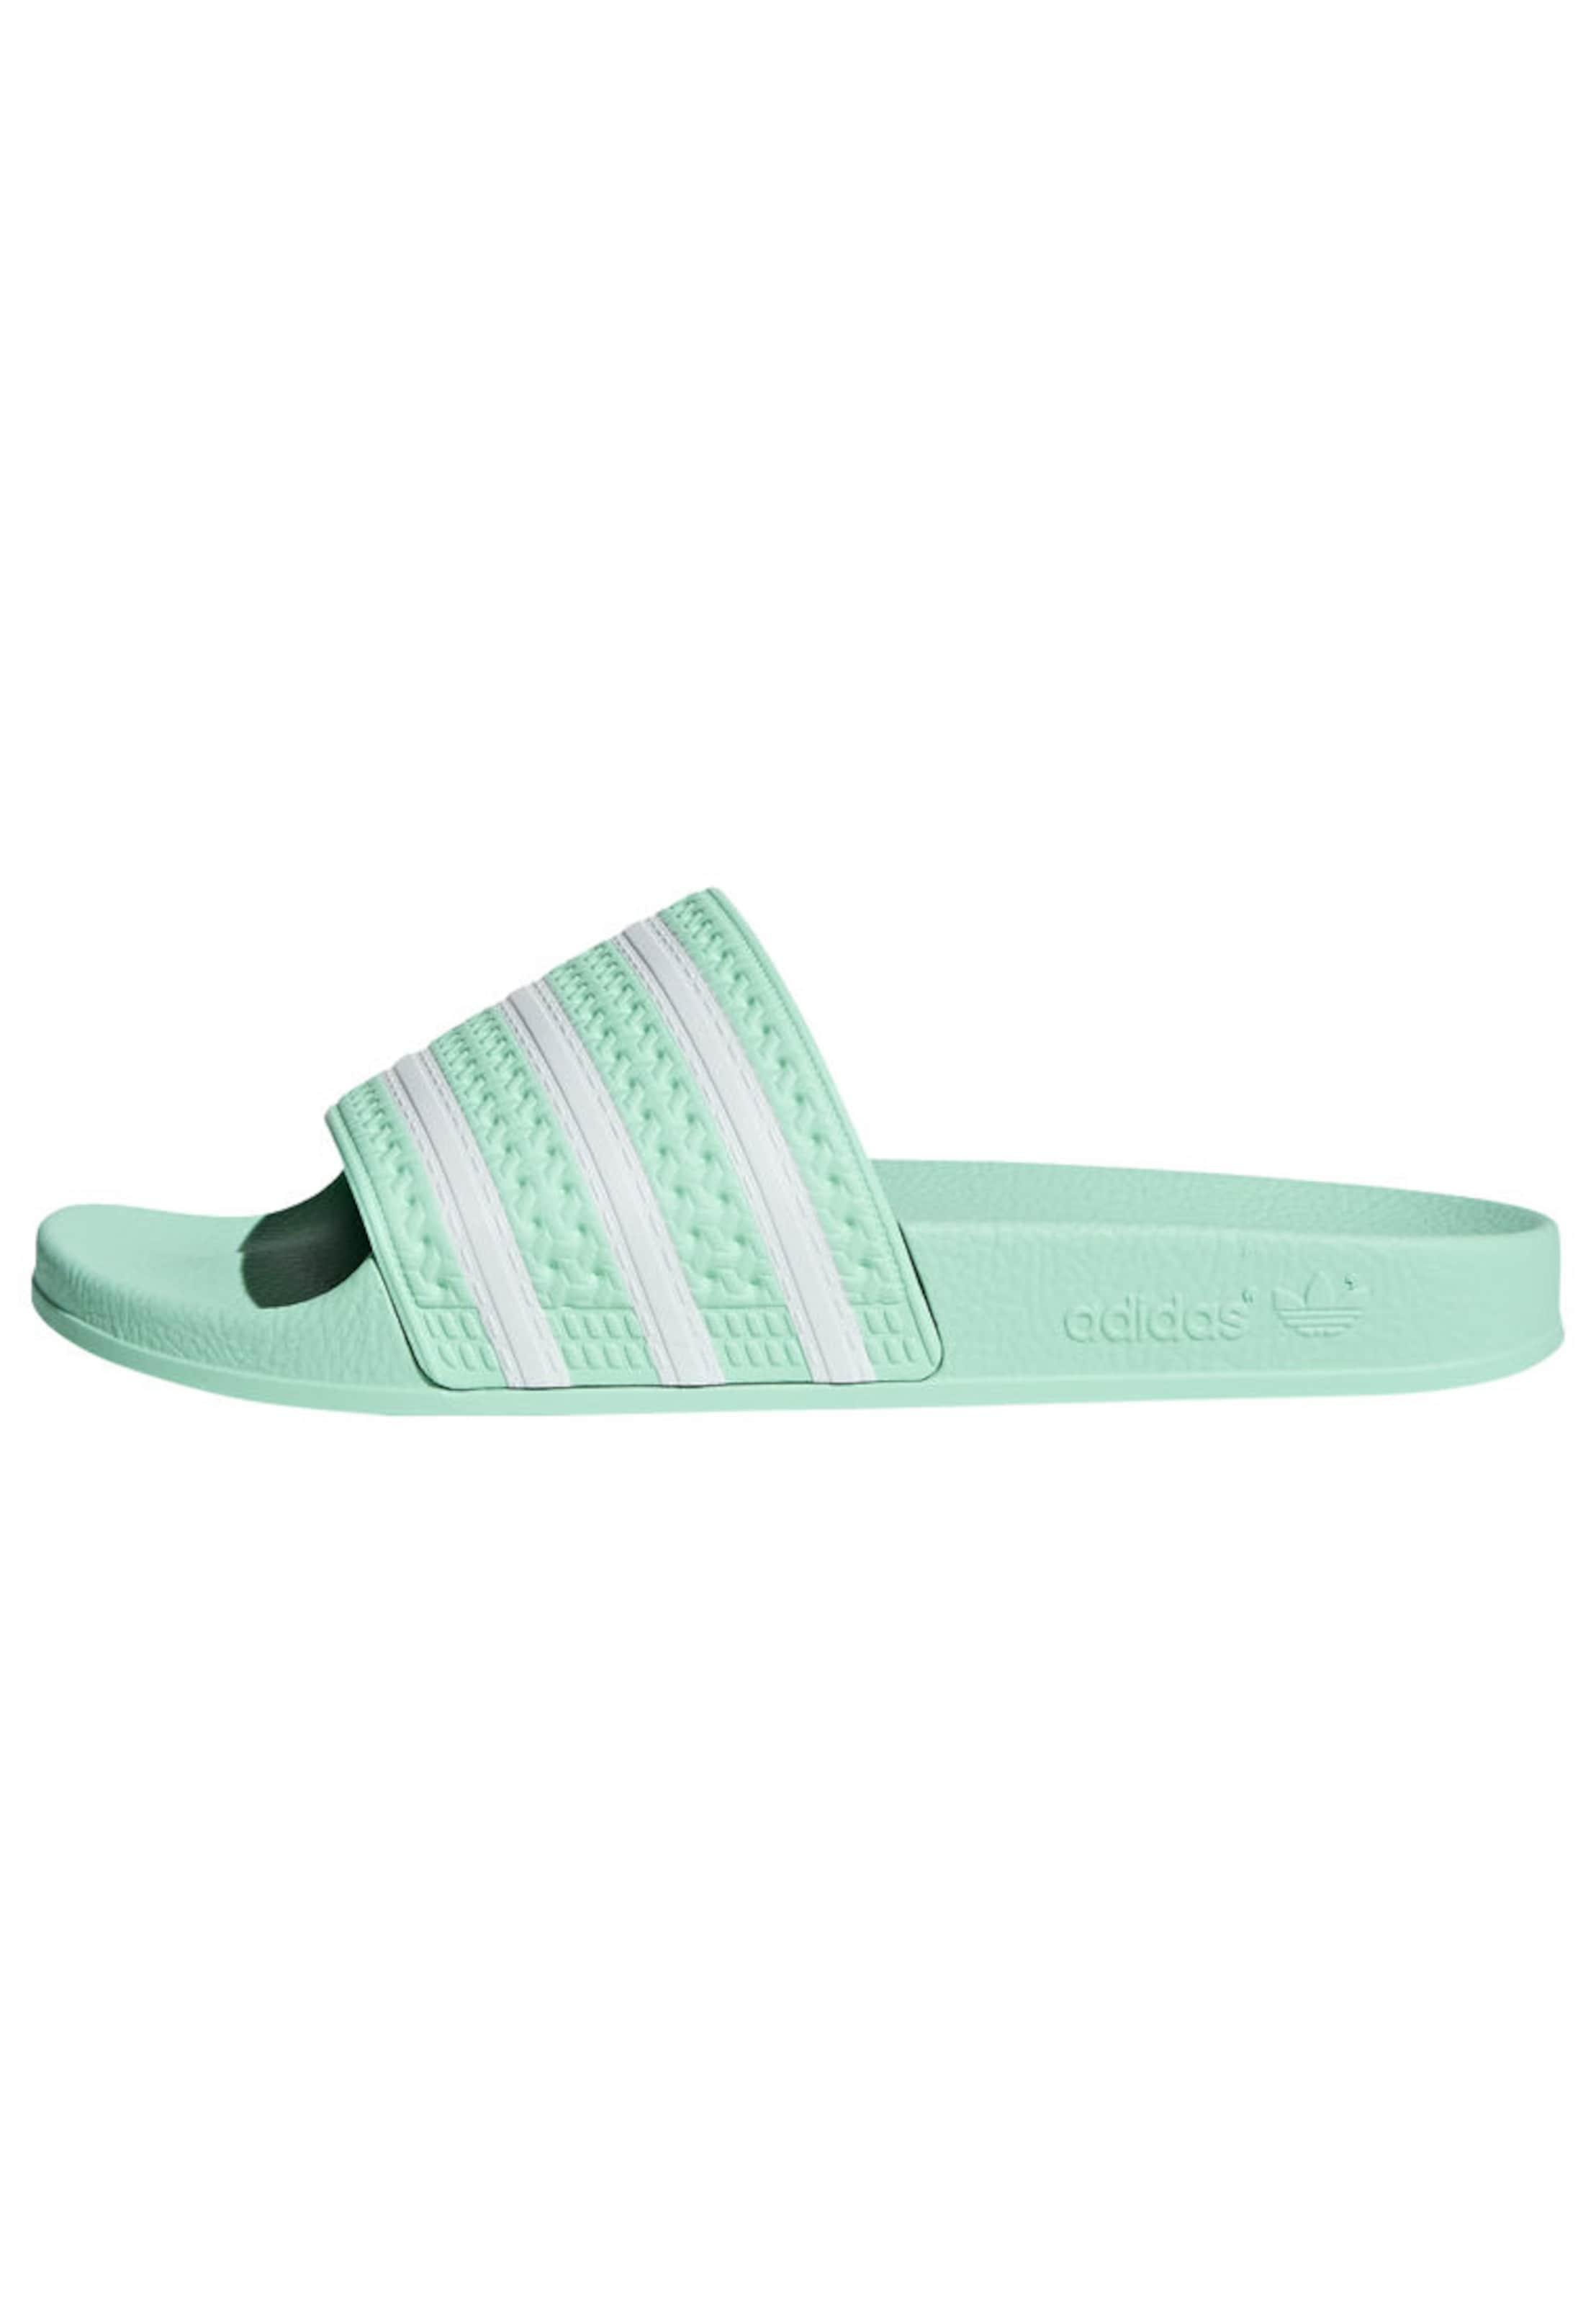 In MintgroenWit 'adilette' Originals Muiltjes Adidas Yb76vImfgy